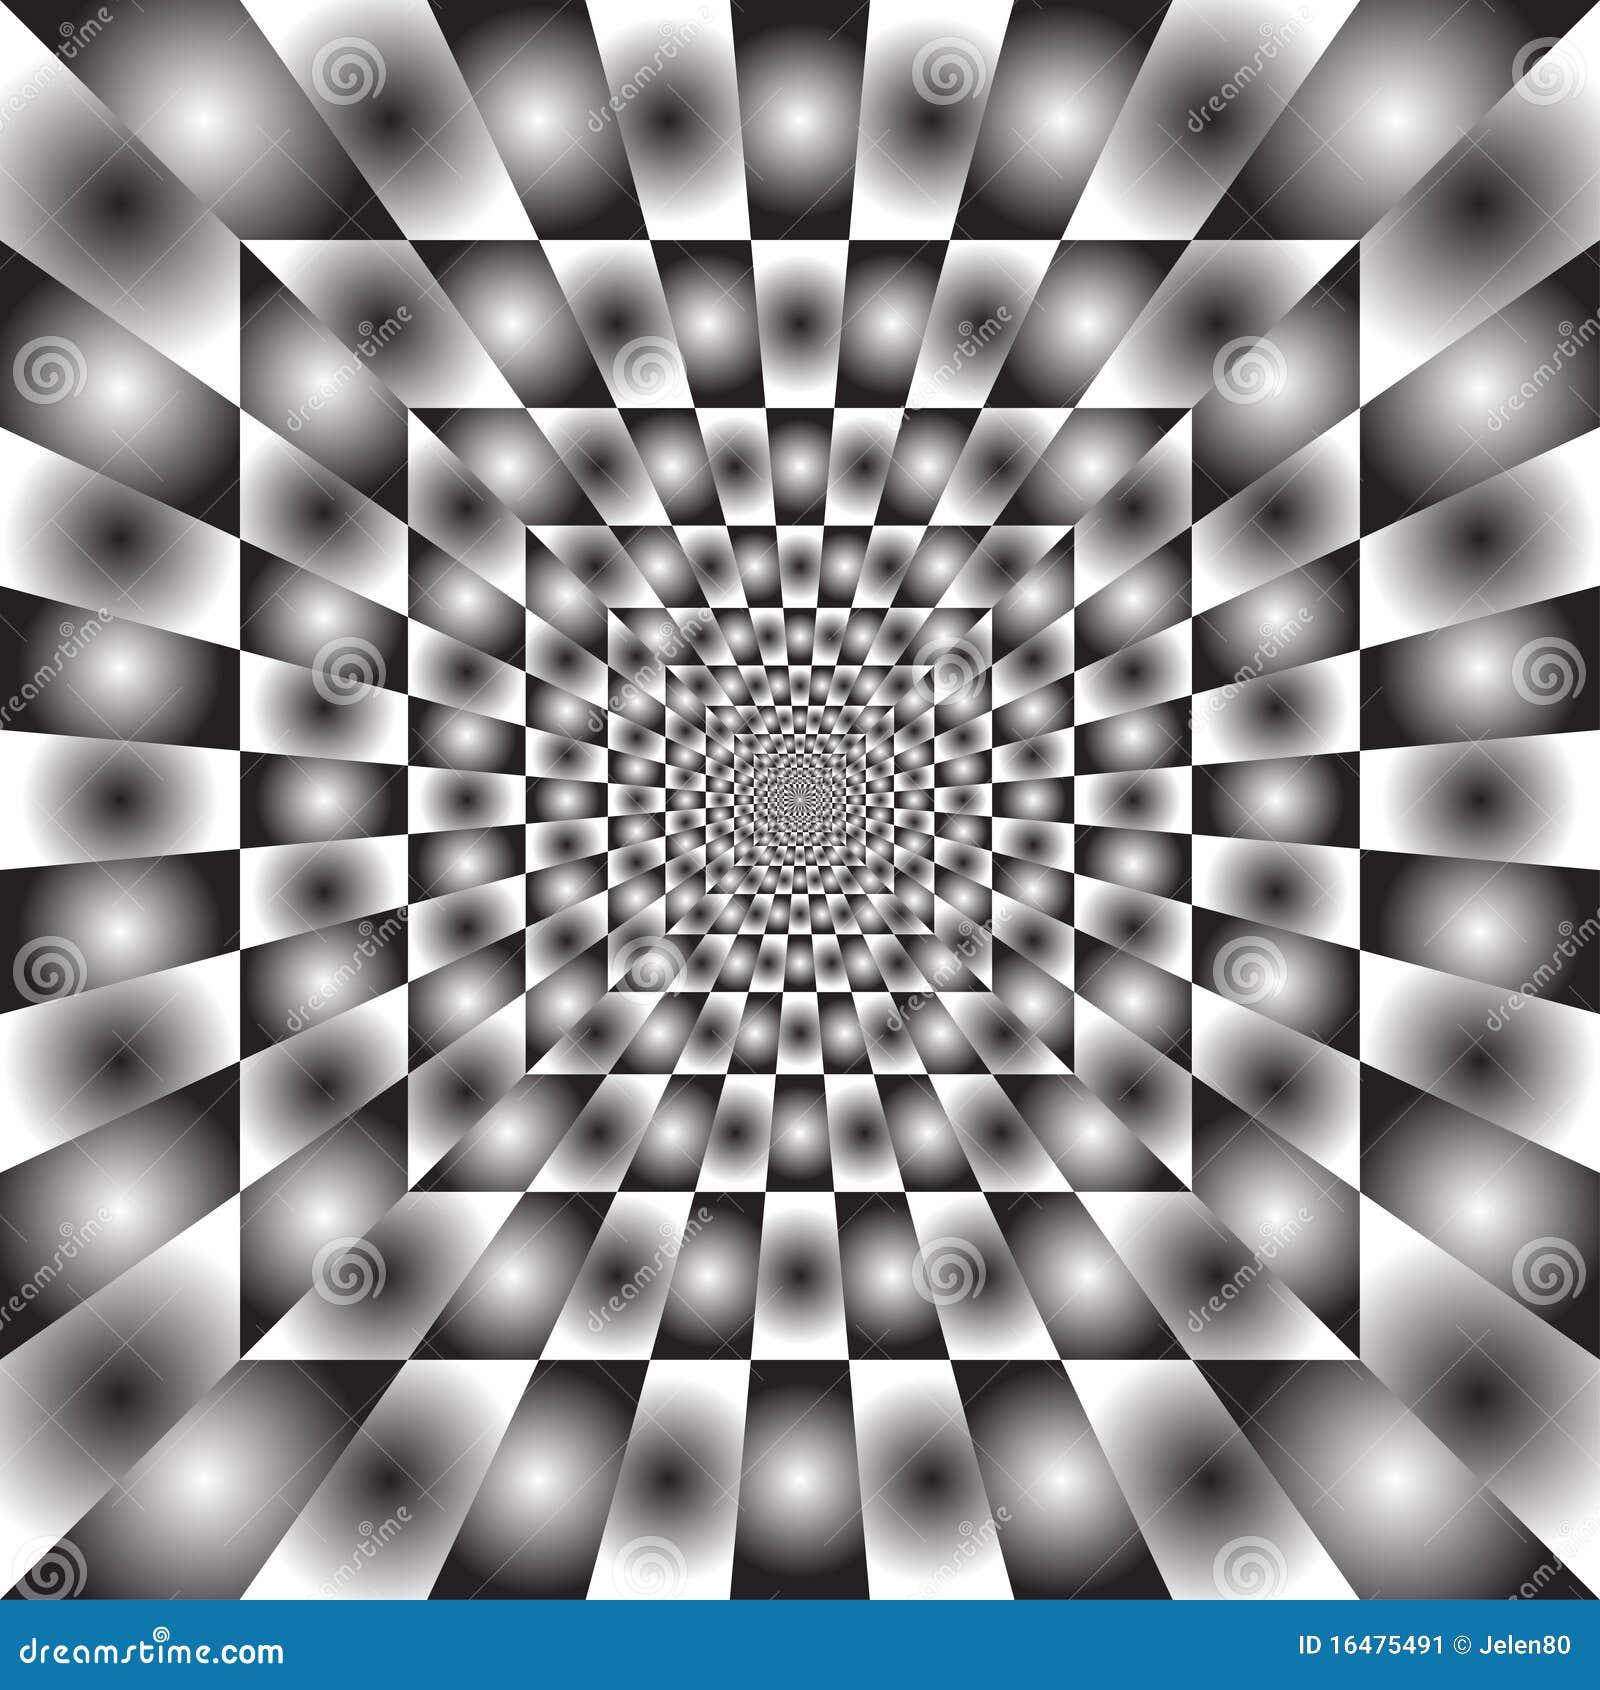 Hypnotic ray background